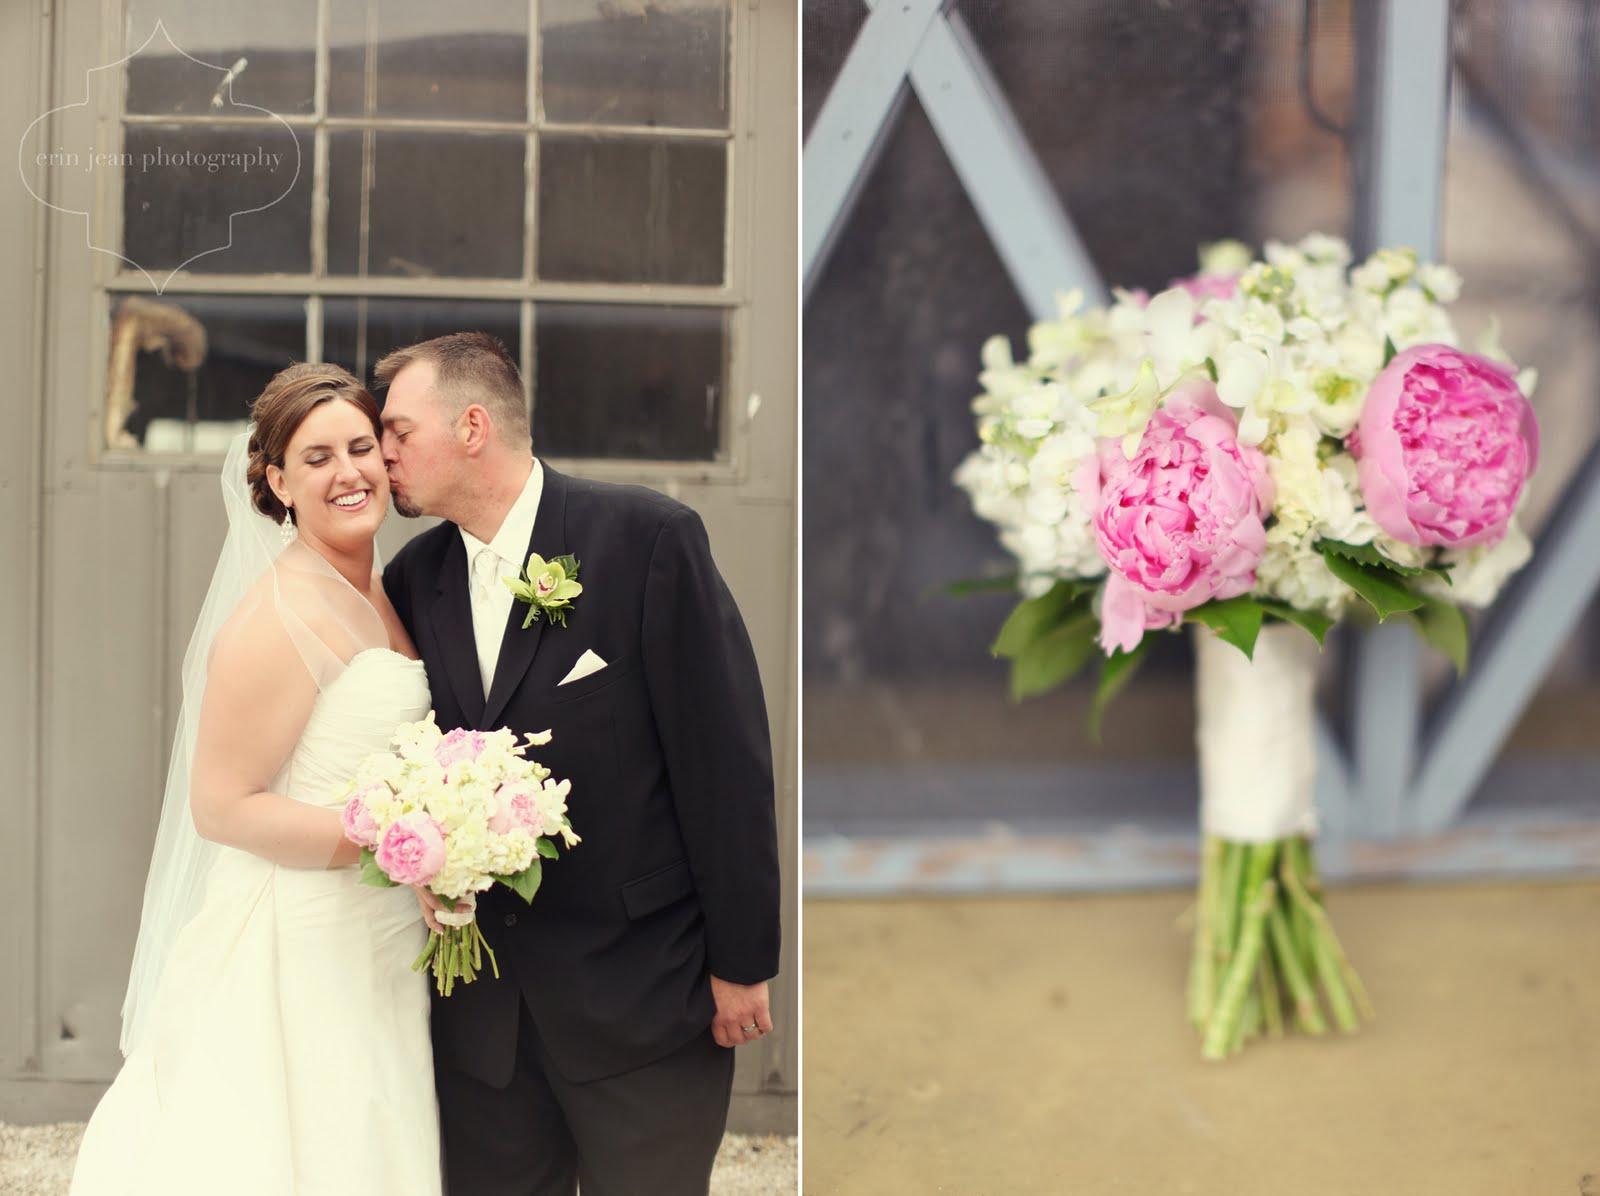 Allison and christopher wedding